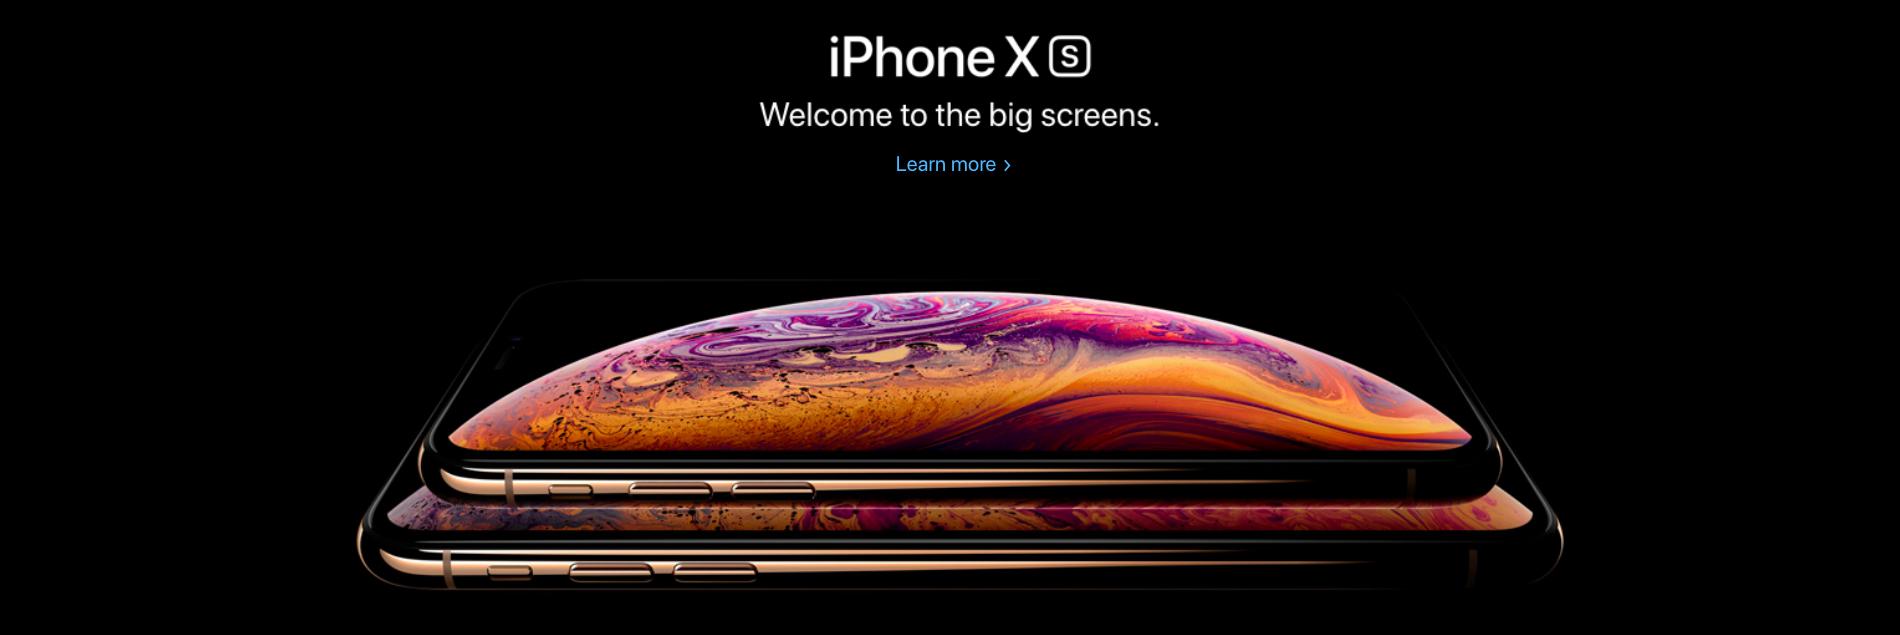 iphone xs series